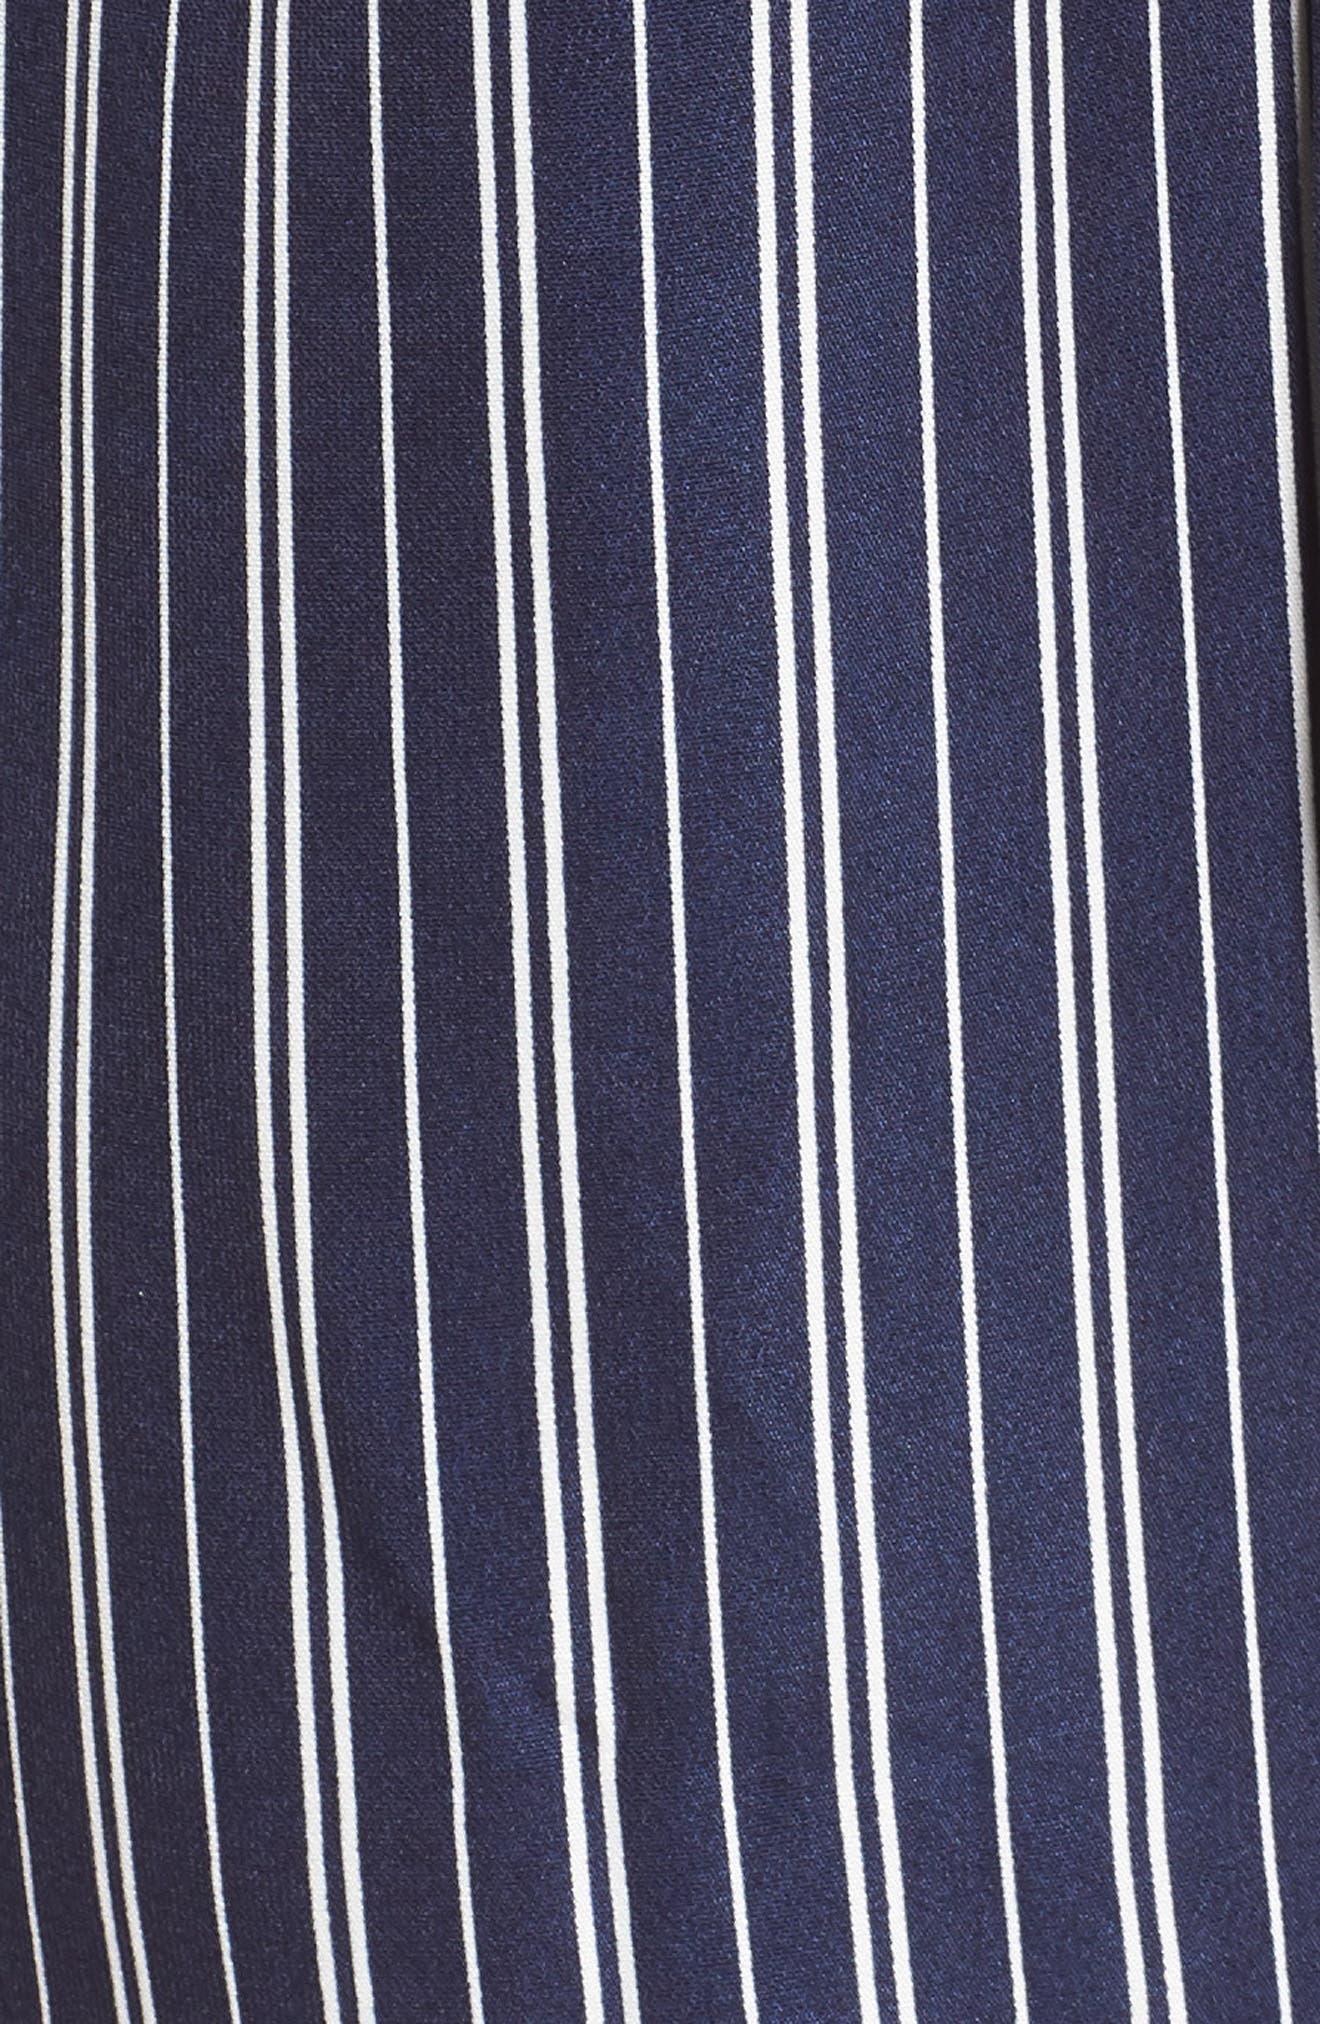 Off the Shoulder Shirtdress,                             Alternate thumbnail 5, color,                             Navy Stripe